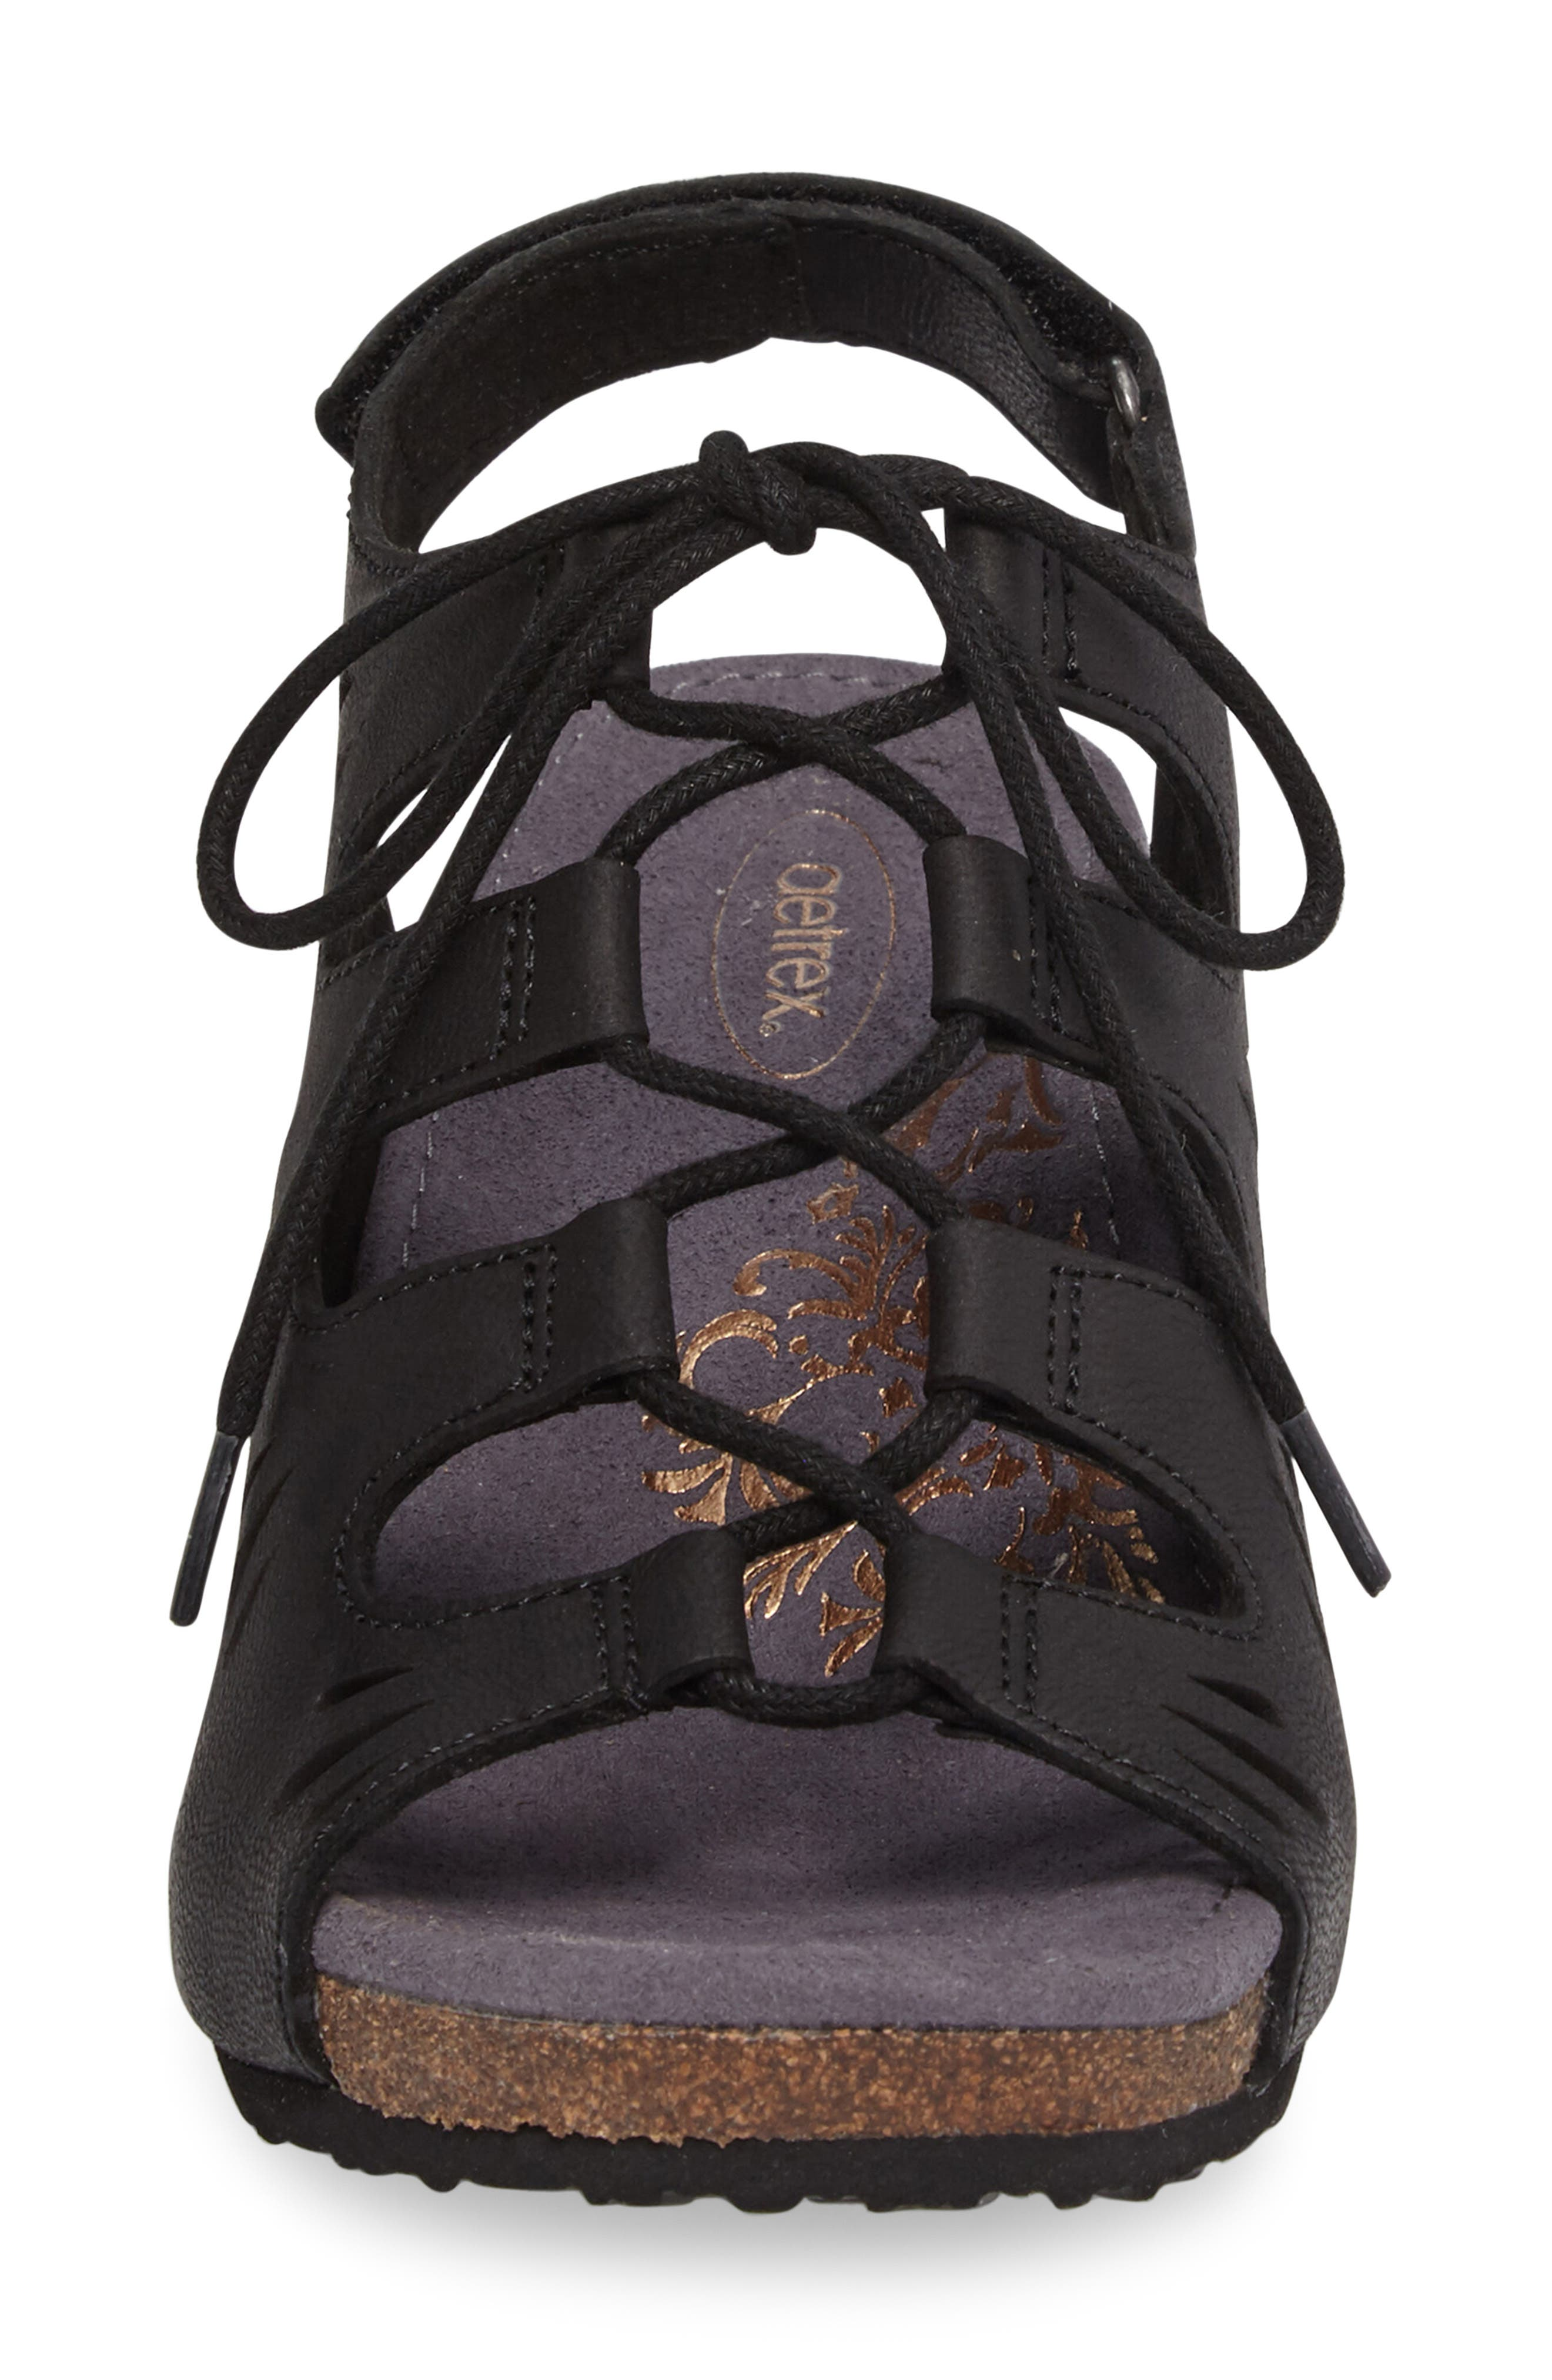 Giselle Slingback Wedge Sandal,                             Alternate thumbnail 4, color,                             Black Leather